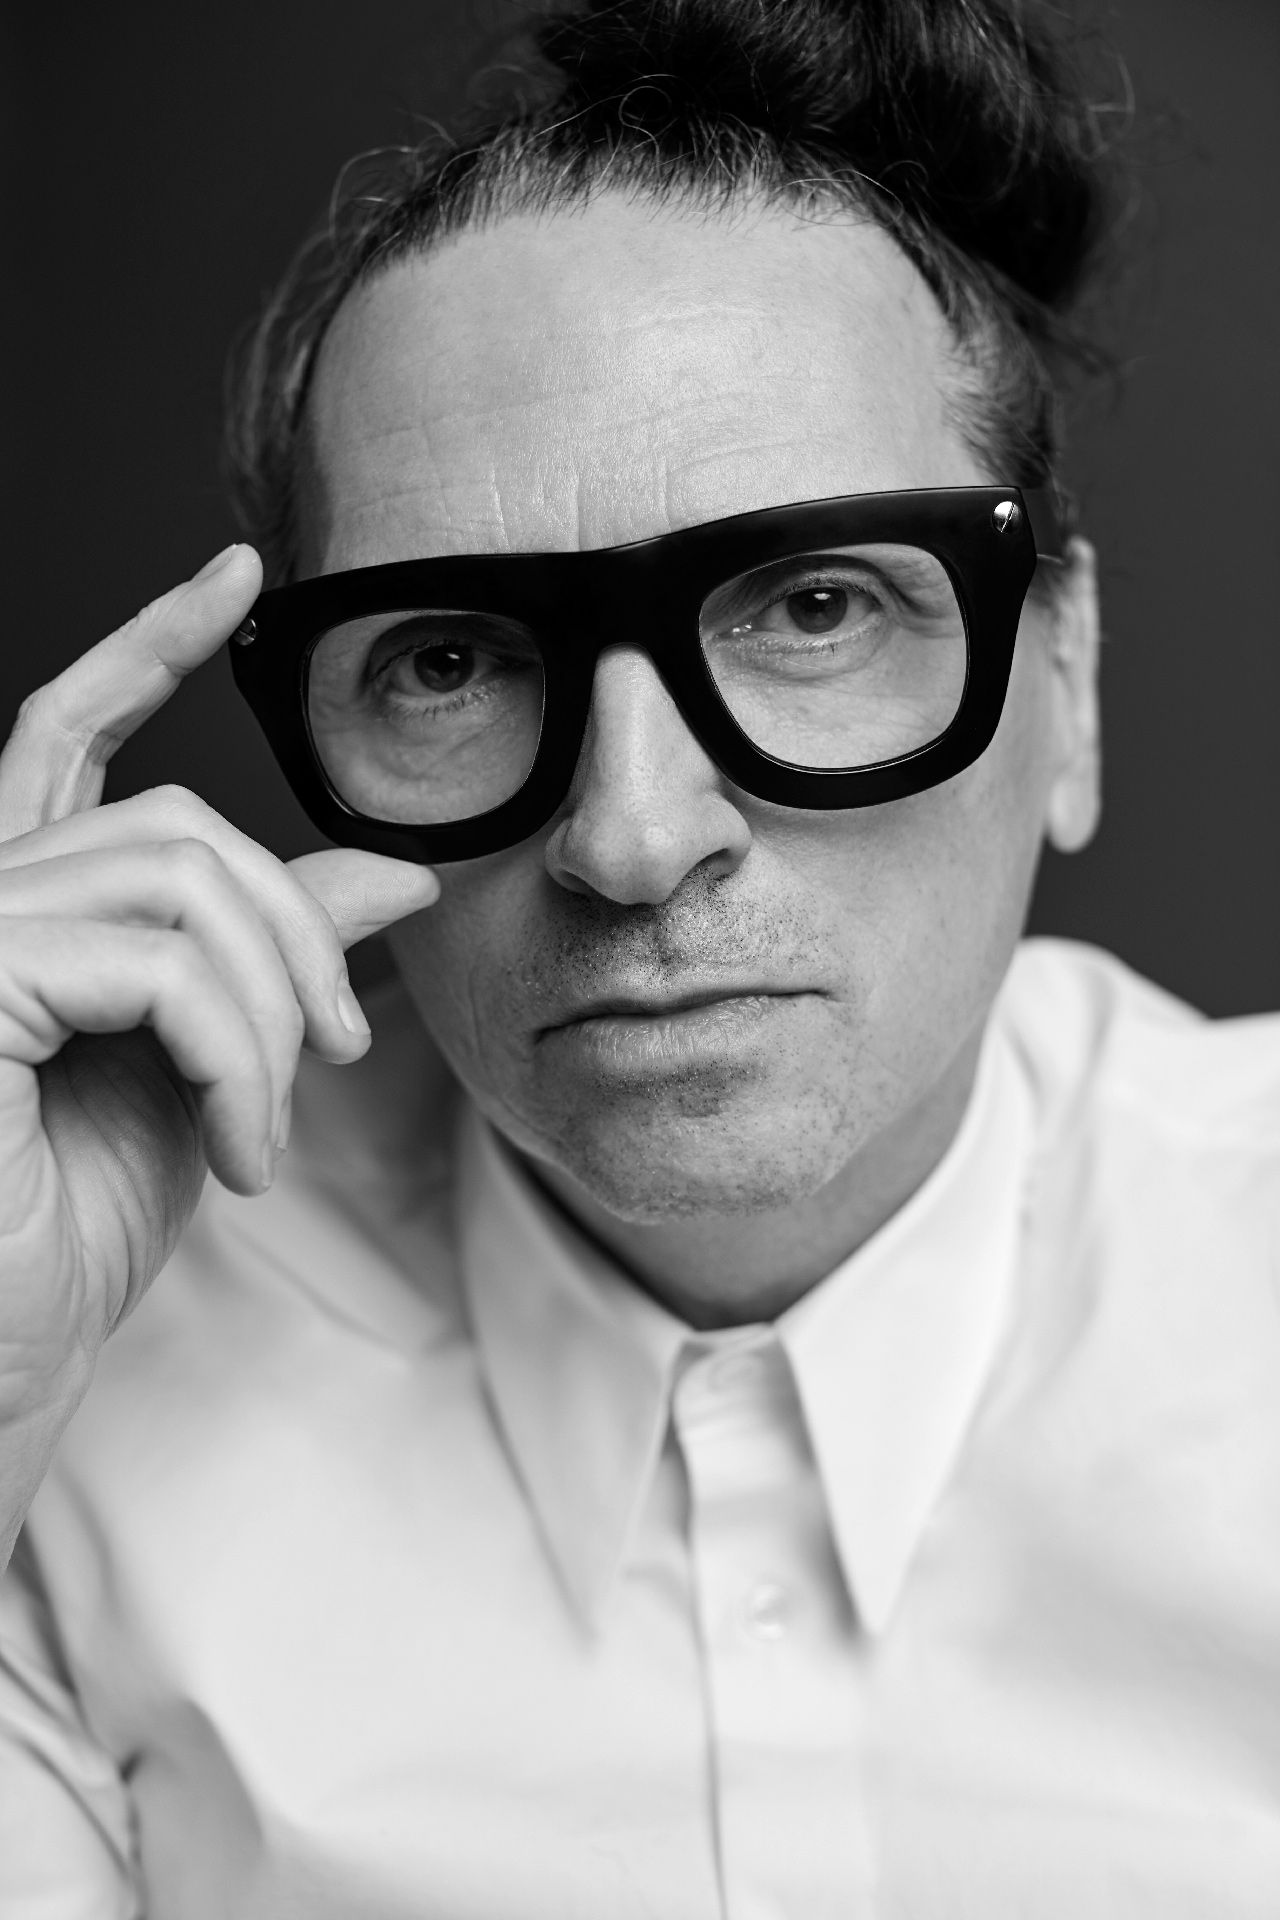 Max Abadian (born in 1967), Denis Gagnon, 2019, digital print. Maxville Studios, Montreal